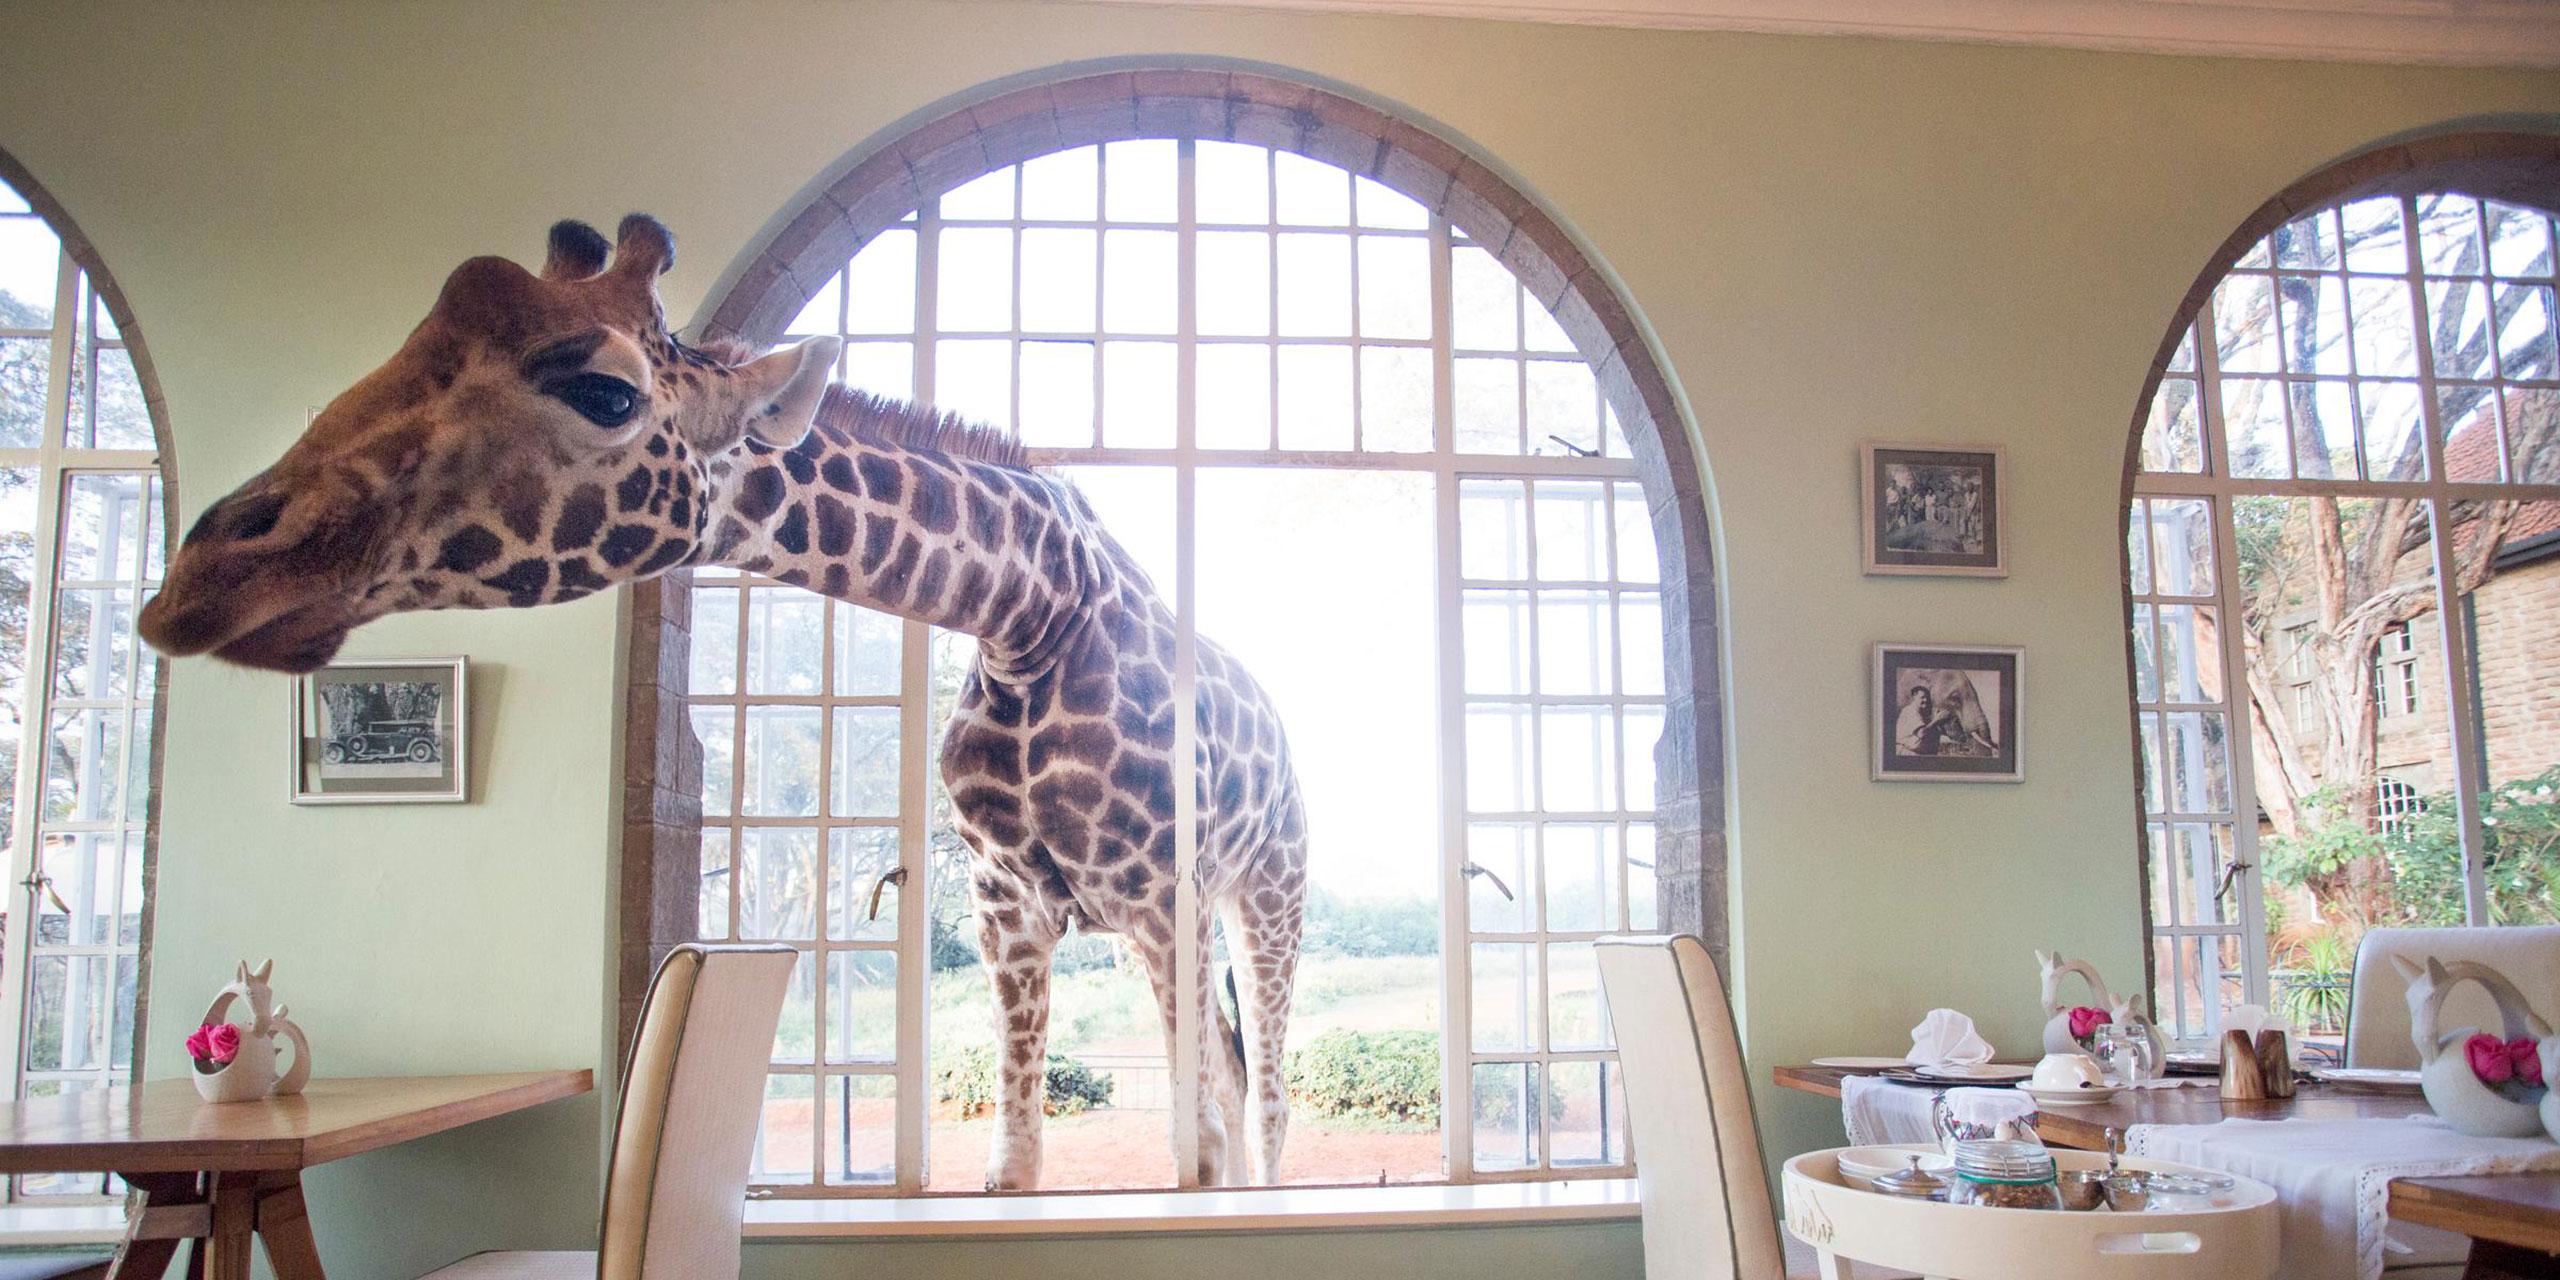 Giraffe Manor; Courtesy of Giraffe Manor